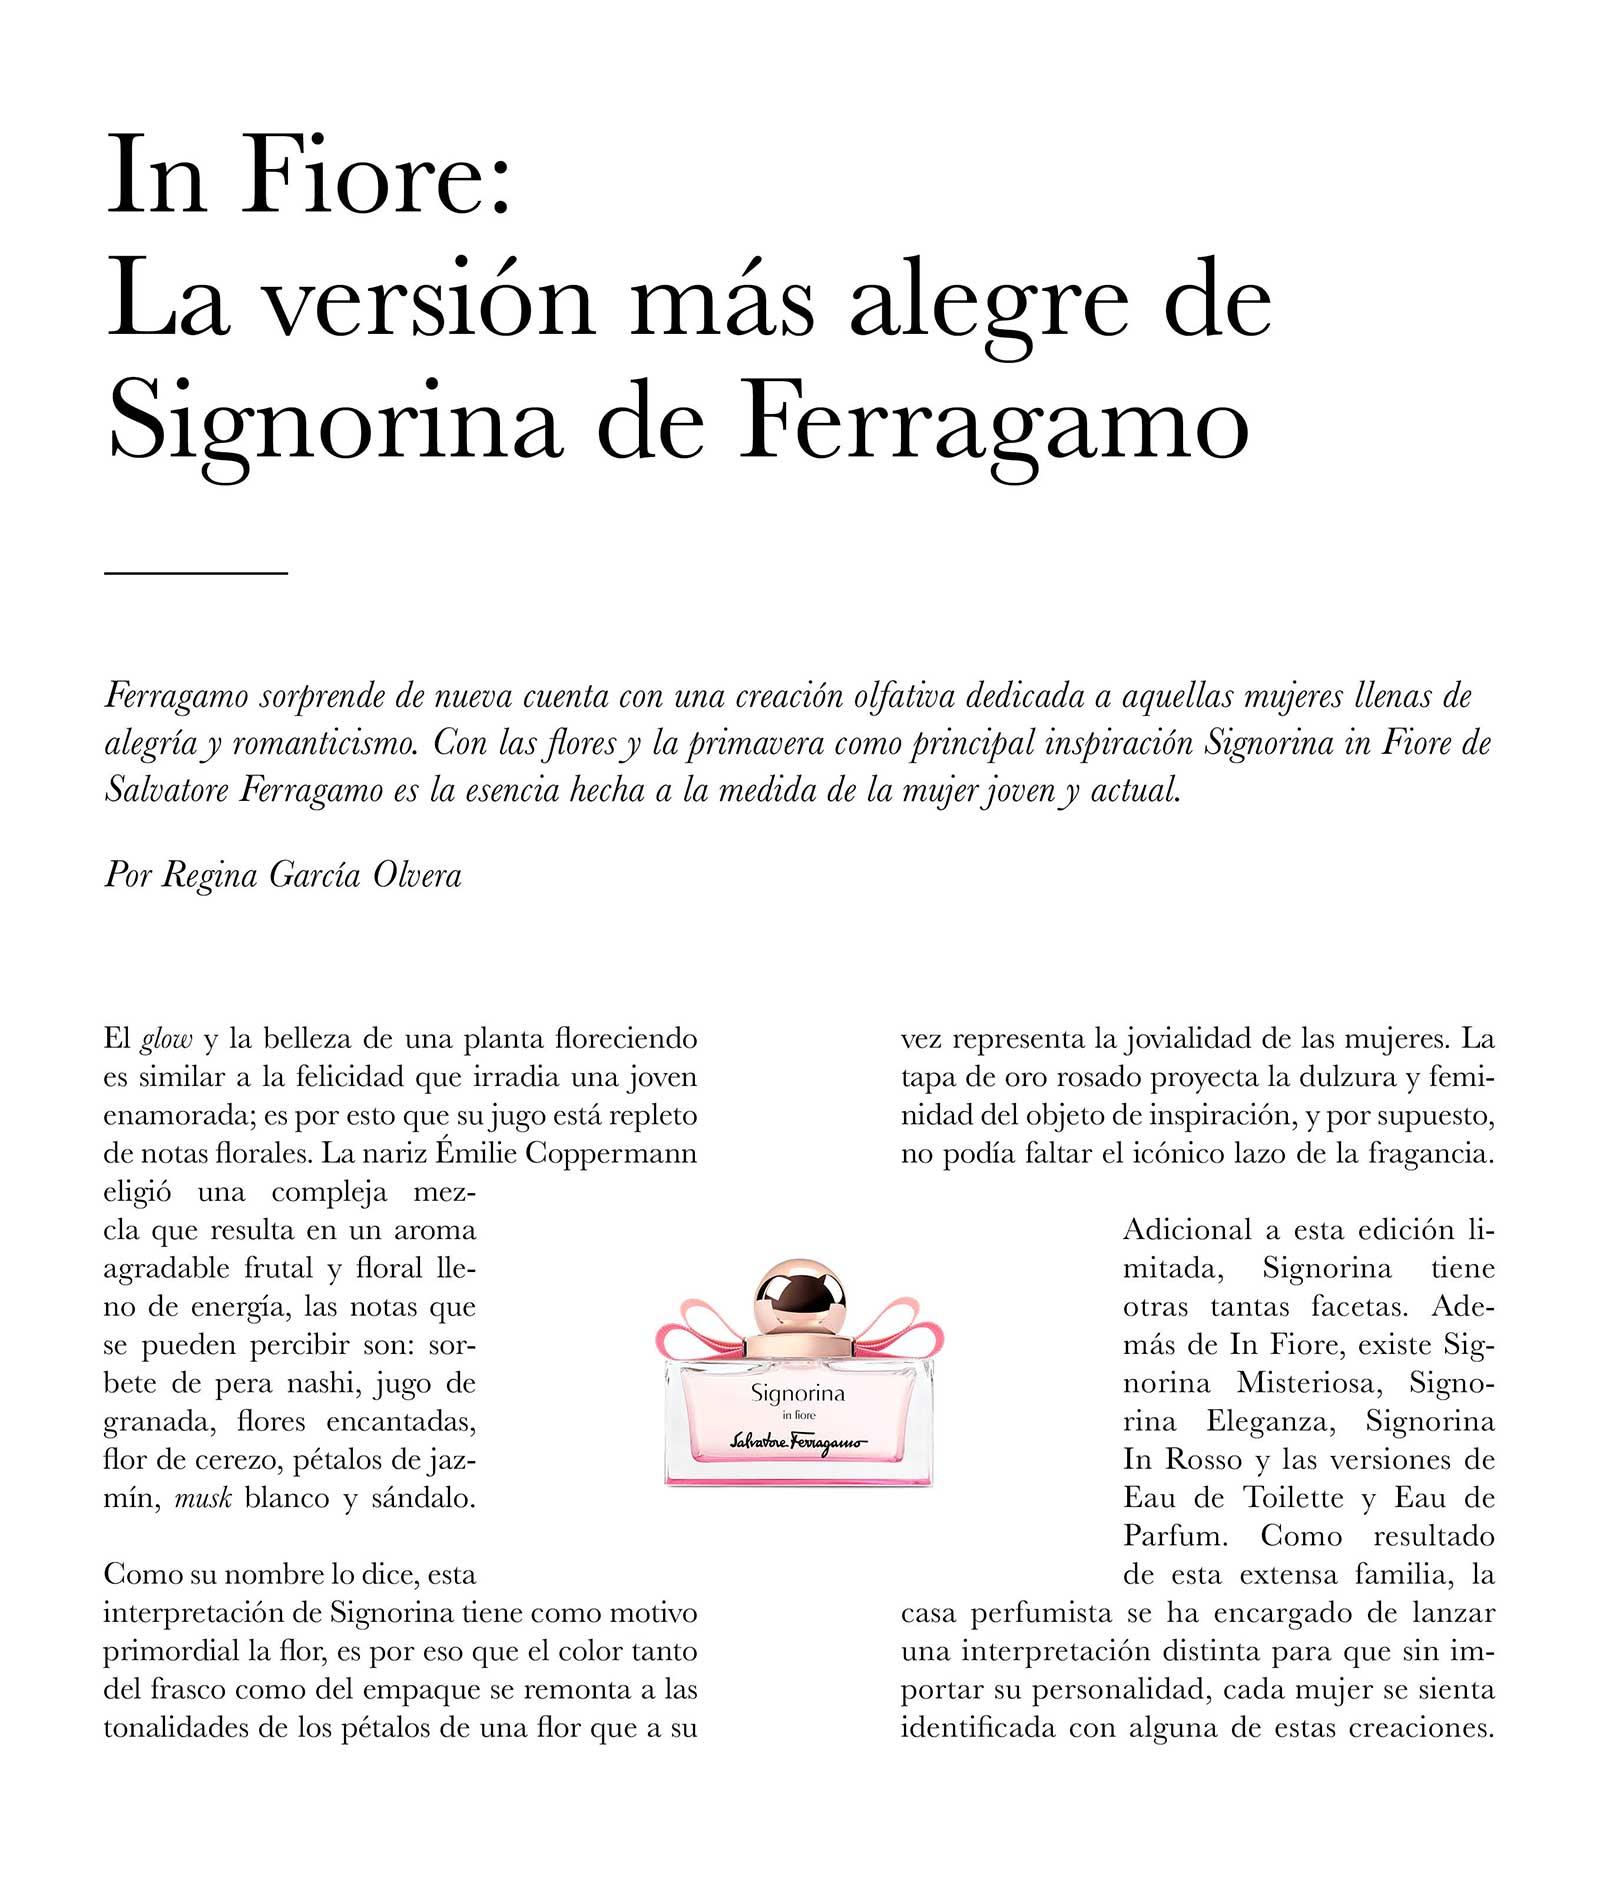 Signorina de Ferragamo